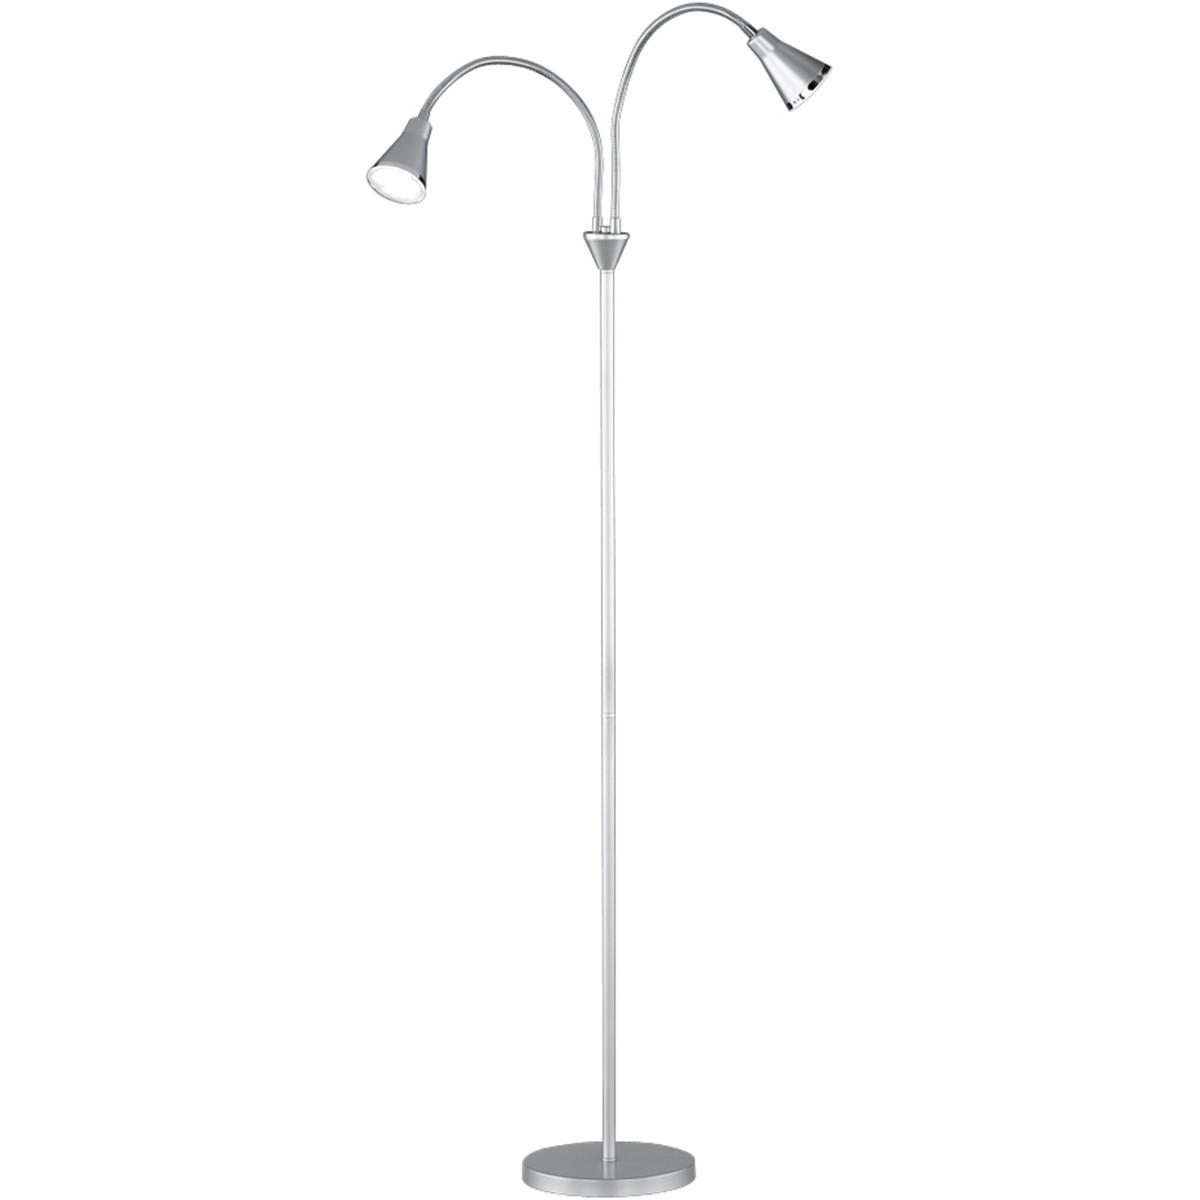 LED Vloerlamp - Trion Arora - 6W - Warm Wit 3000K - 2-lichts - Rond - Mat Titaan - Kunststof